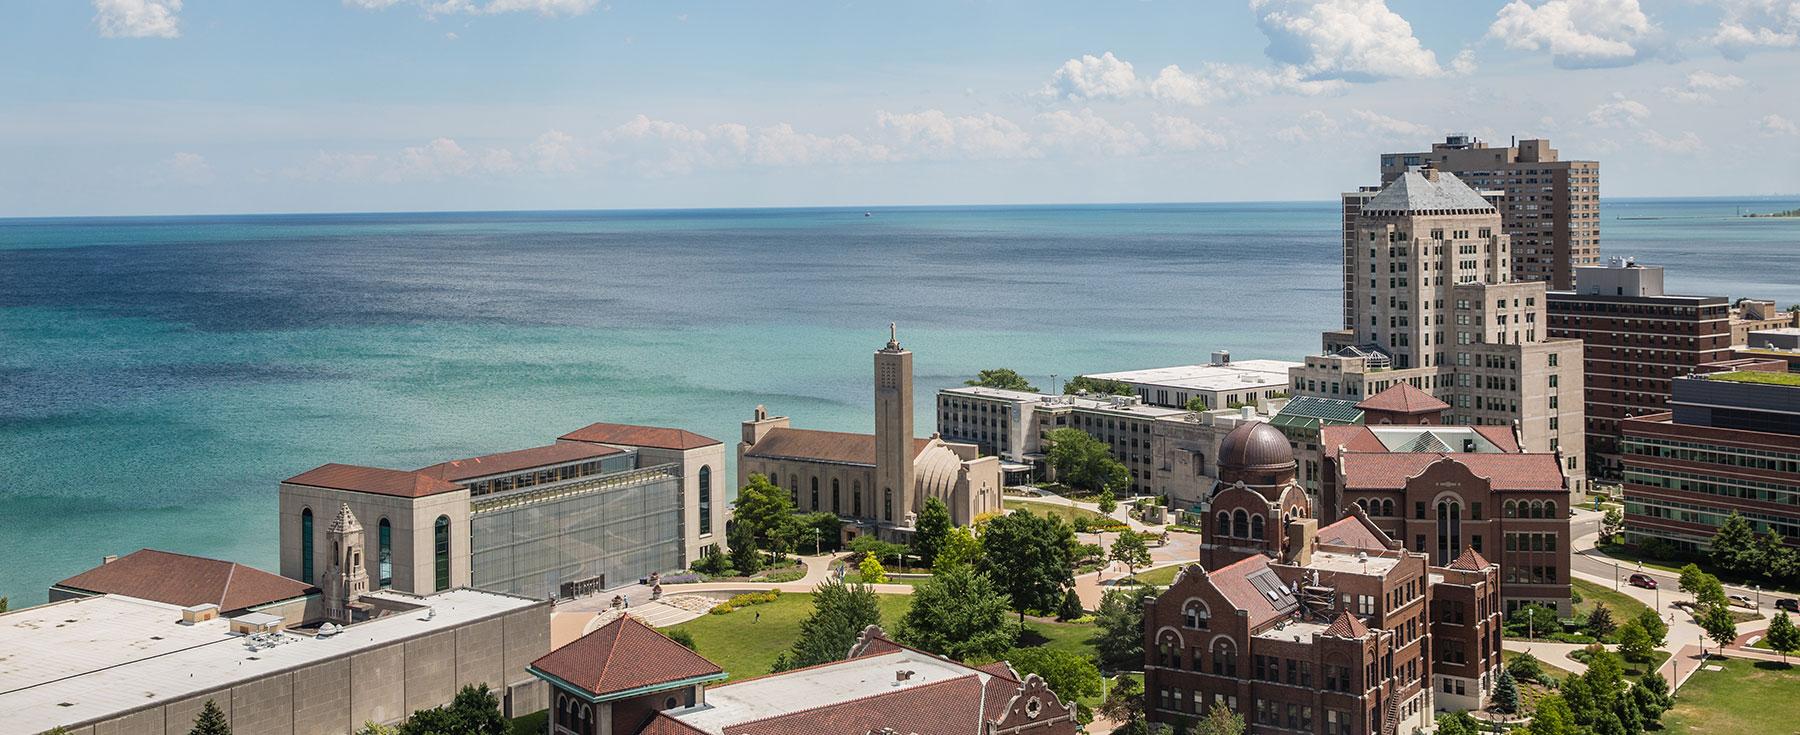 Aerial shot of  Loyola University Chicago .